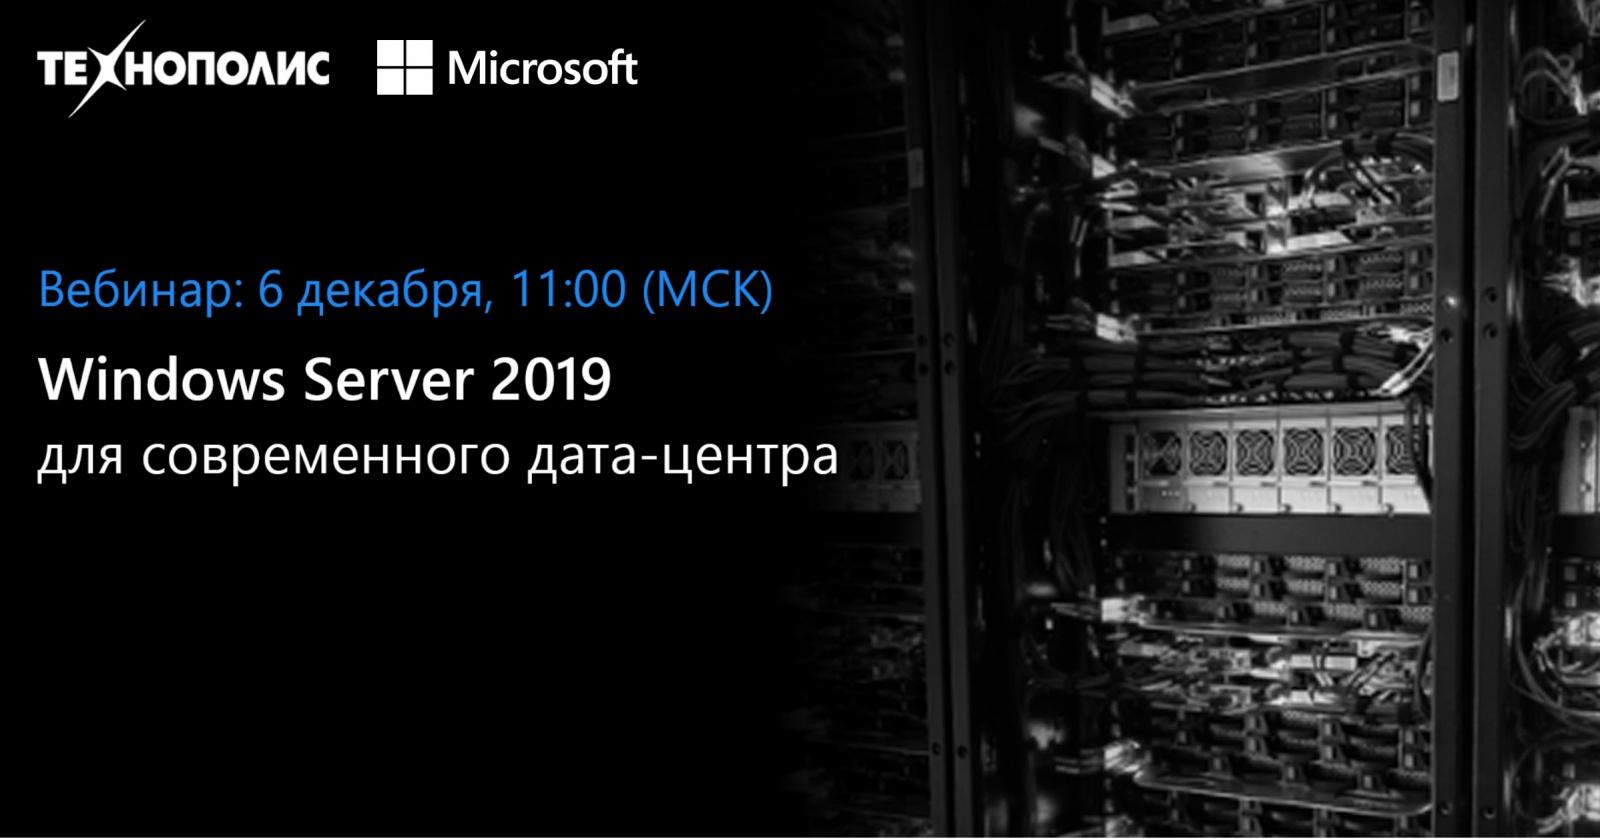 Windows Server 2019 - 6